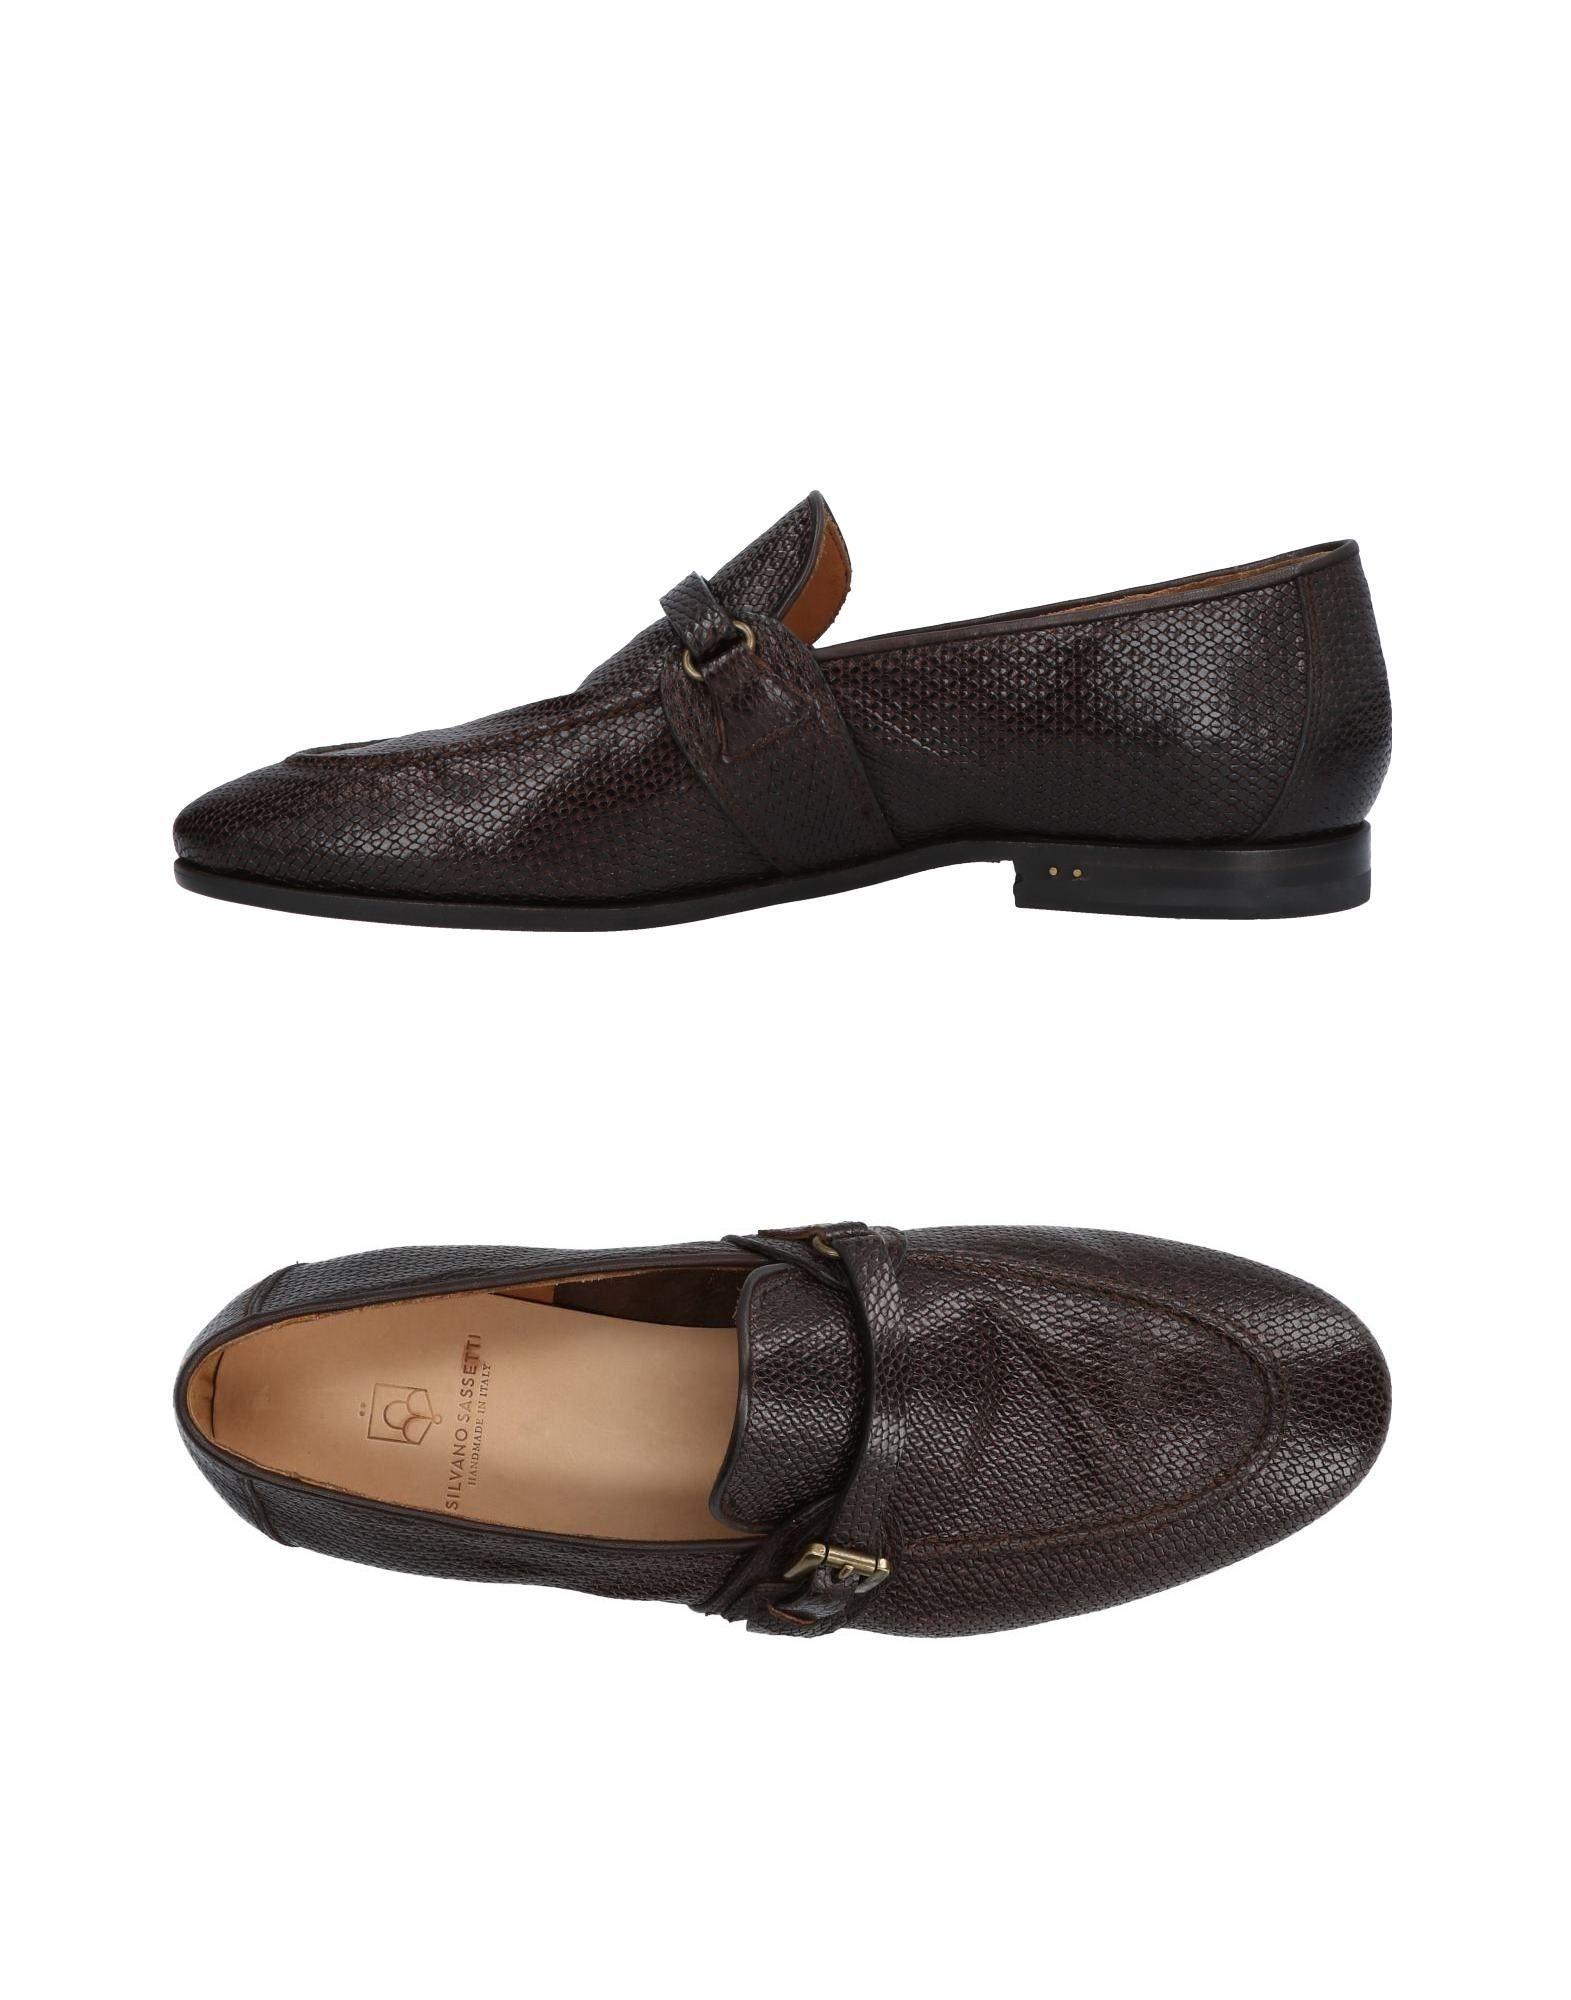 Silvano Sassetti Mokassins Herren  11457364AP Gute Qualität beliebte Schuhe